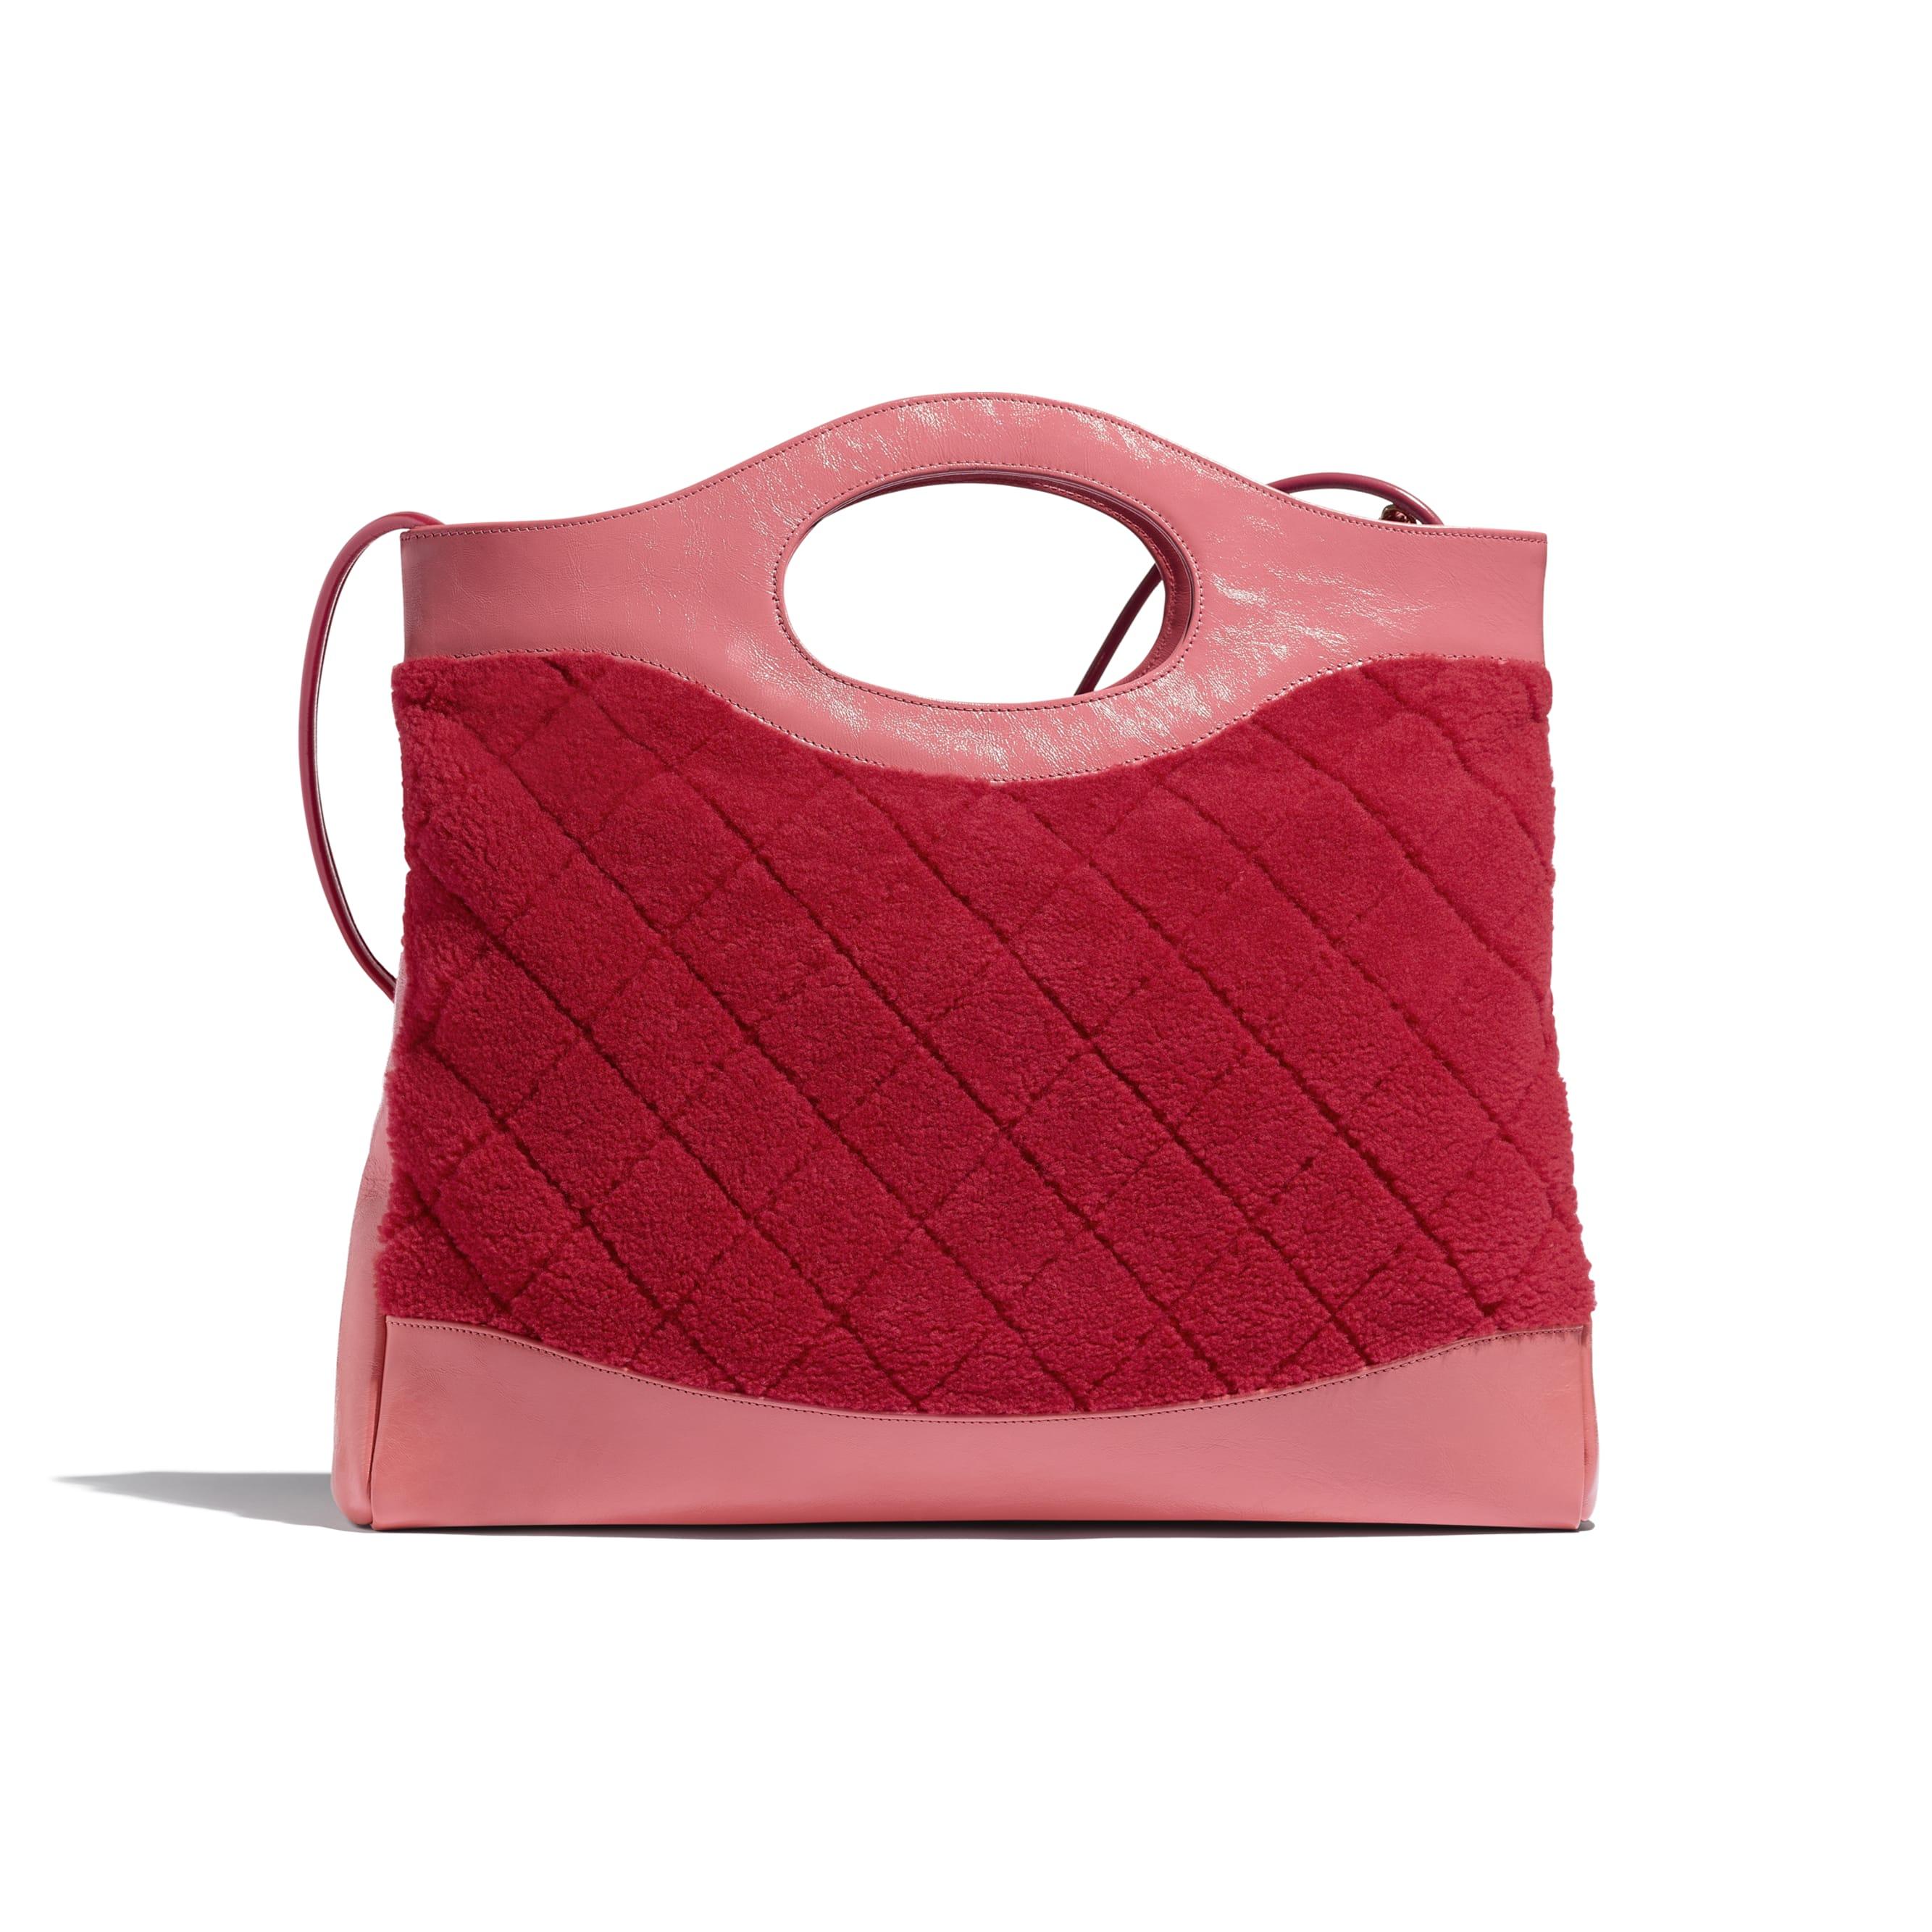 CHANEL 31 Shopping Bag - Red & Pink - Shearling Sheepskin, Calfskin & Gold-Tone Metal - Alternative view - see standard sized version